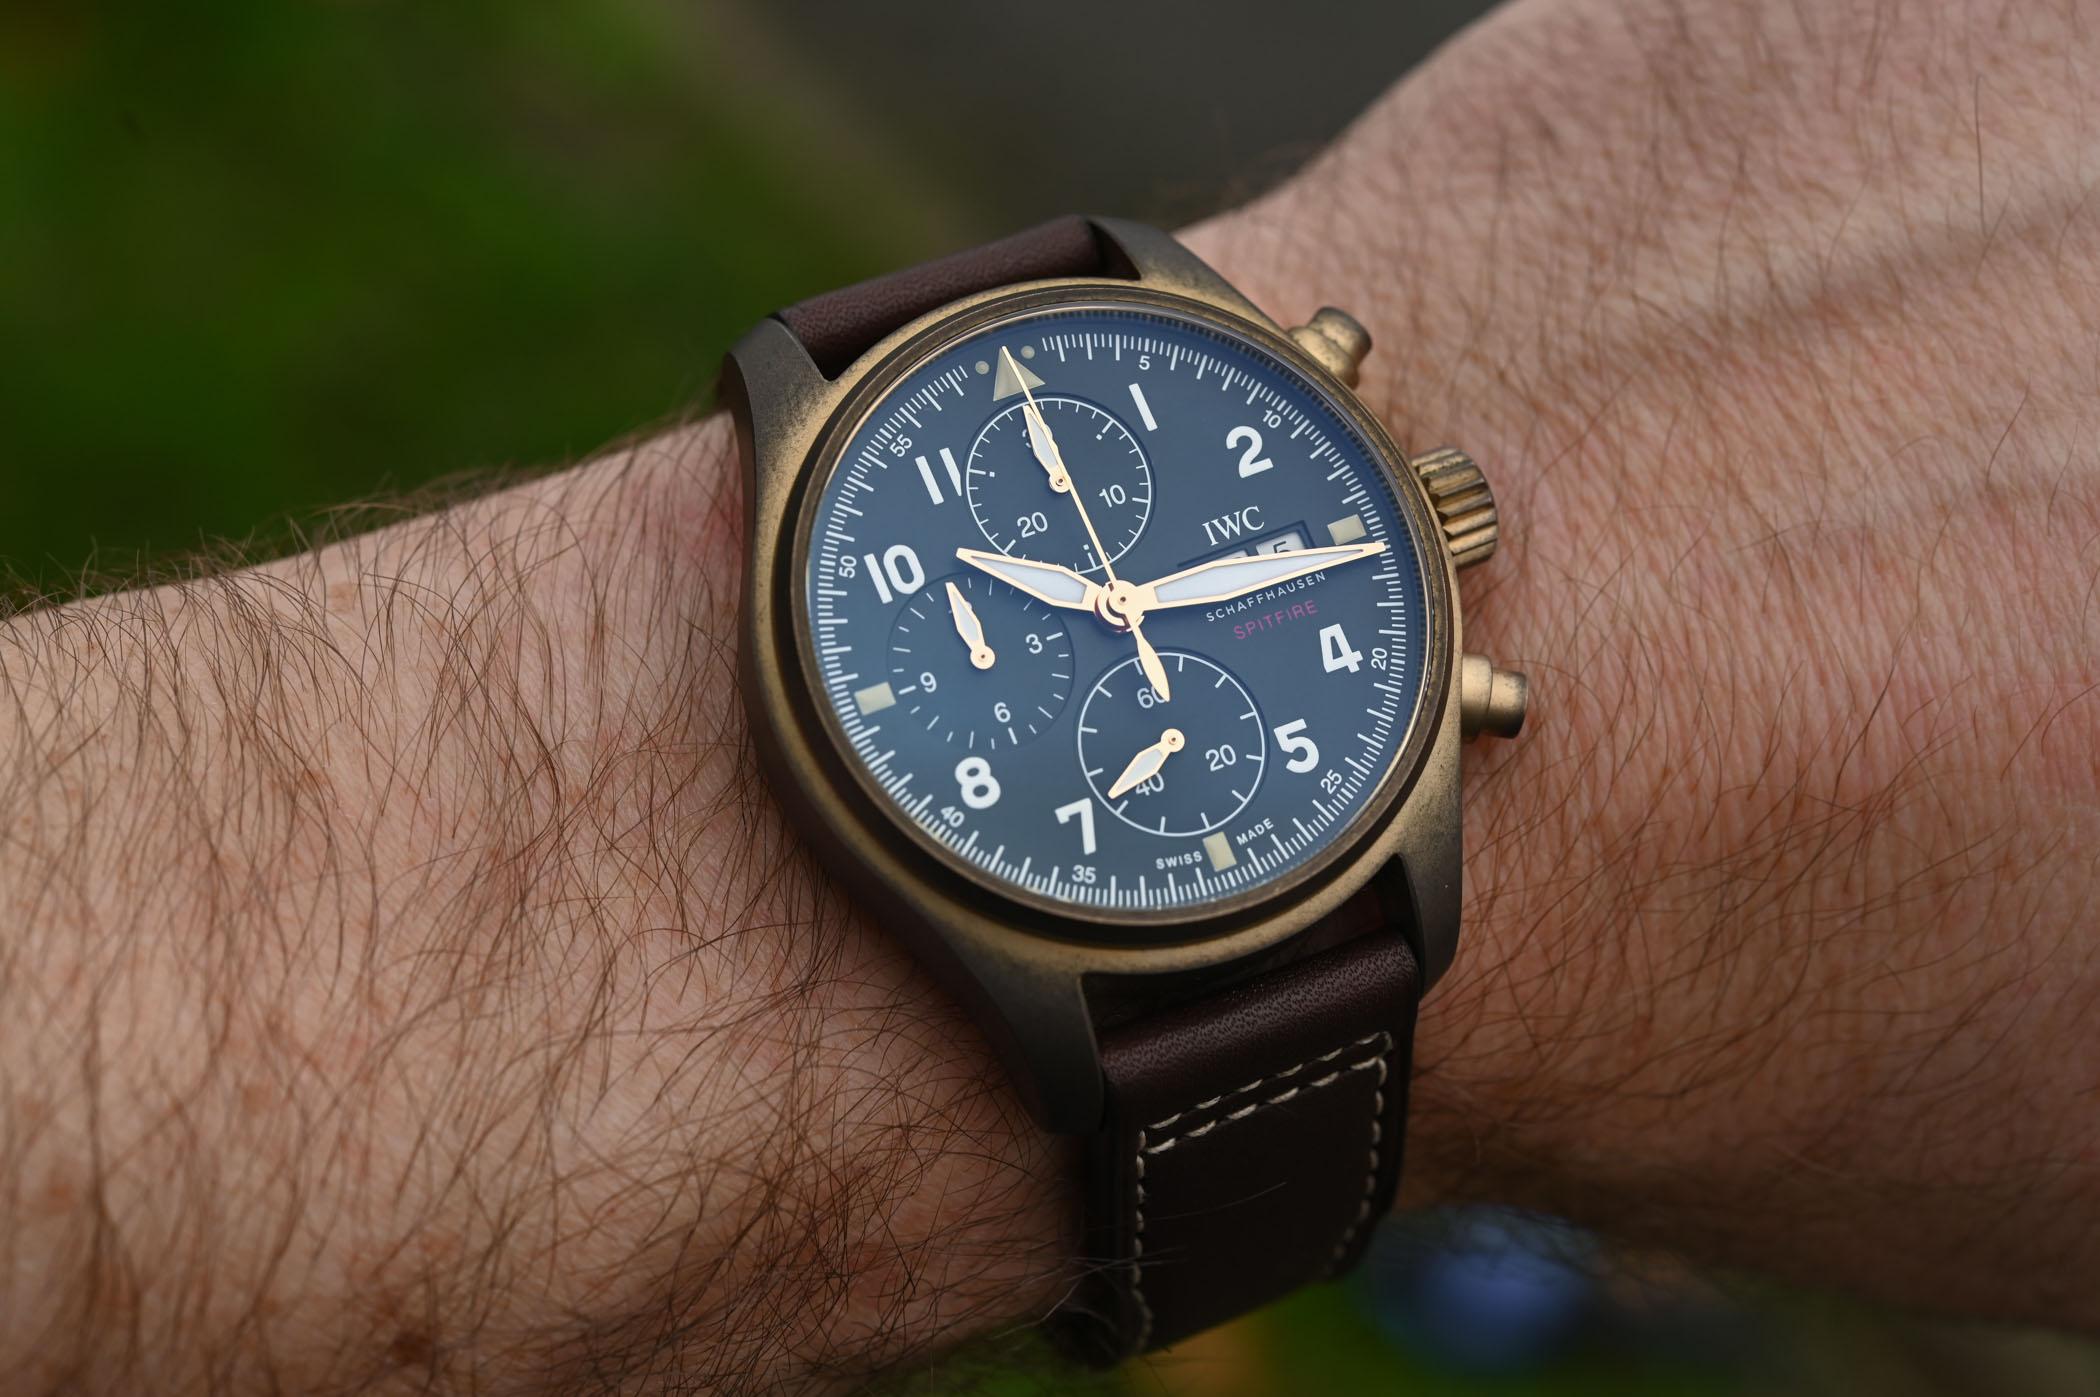 iwc-pilots-watch-chronograph-spitfire-bronze-iw387902-sihh-2019-18.jpg